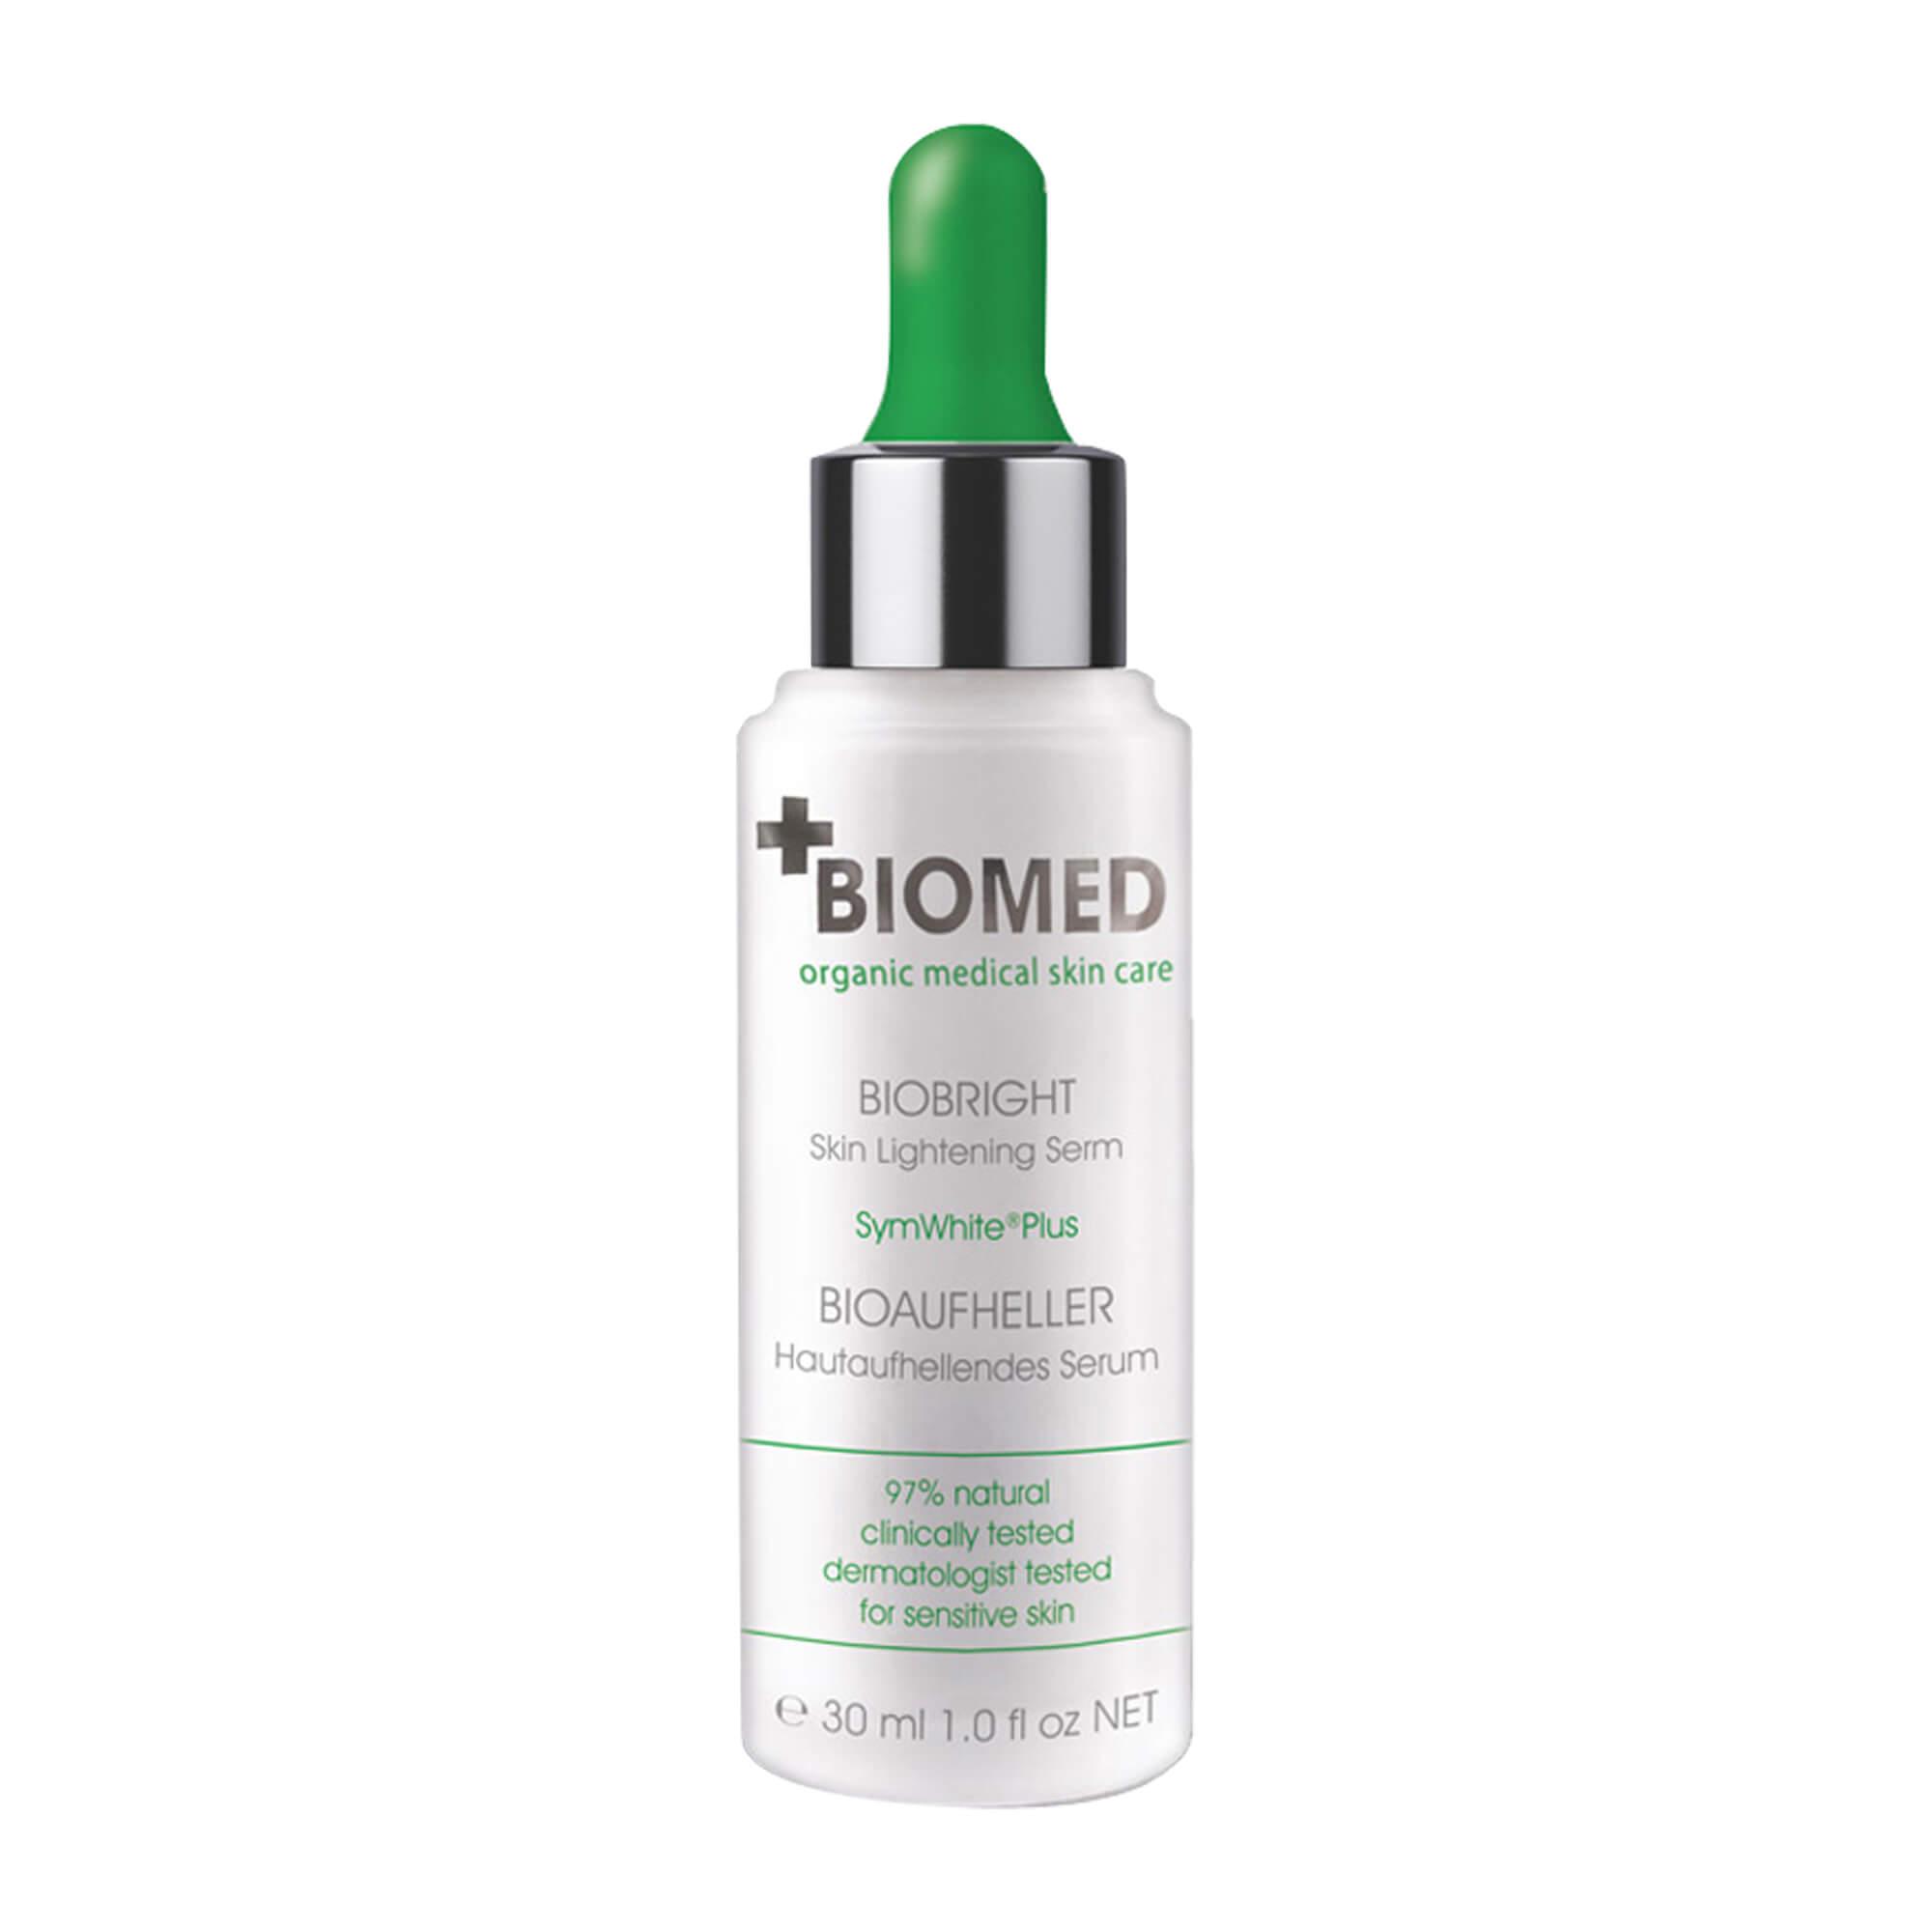 BIOMED Bio-Aufheller Serum